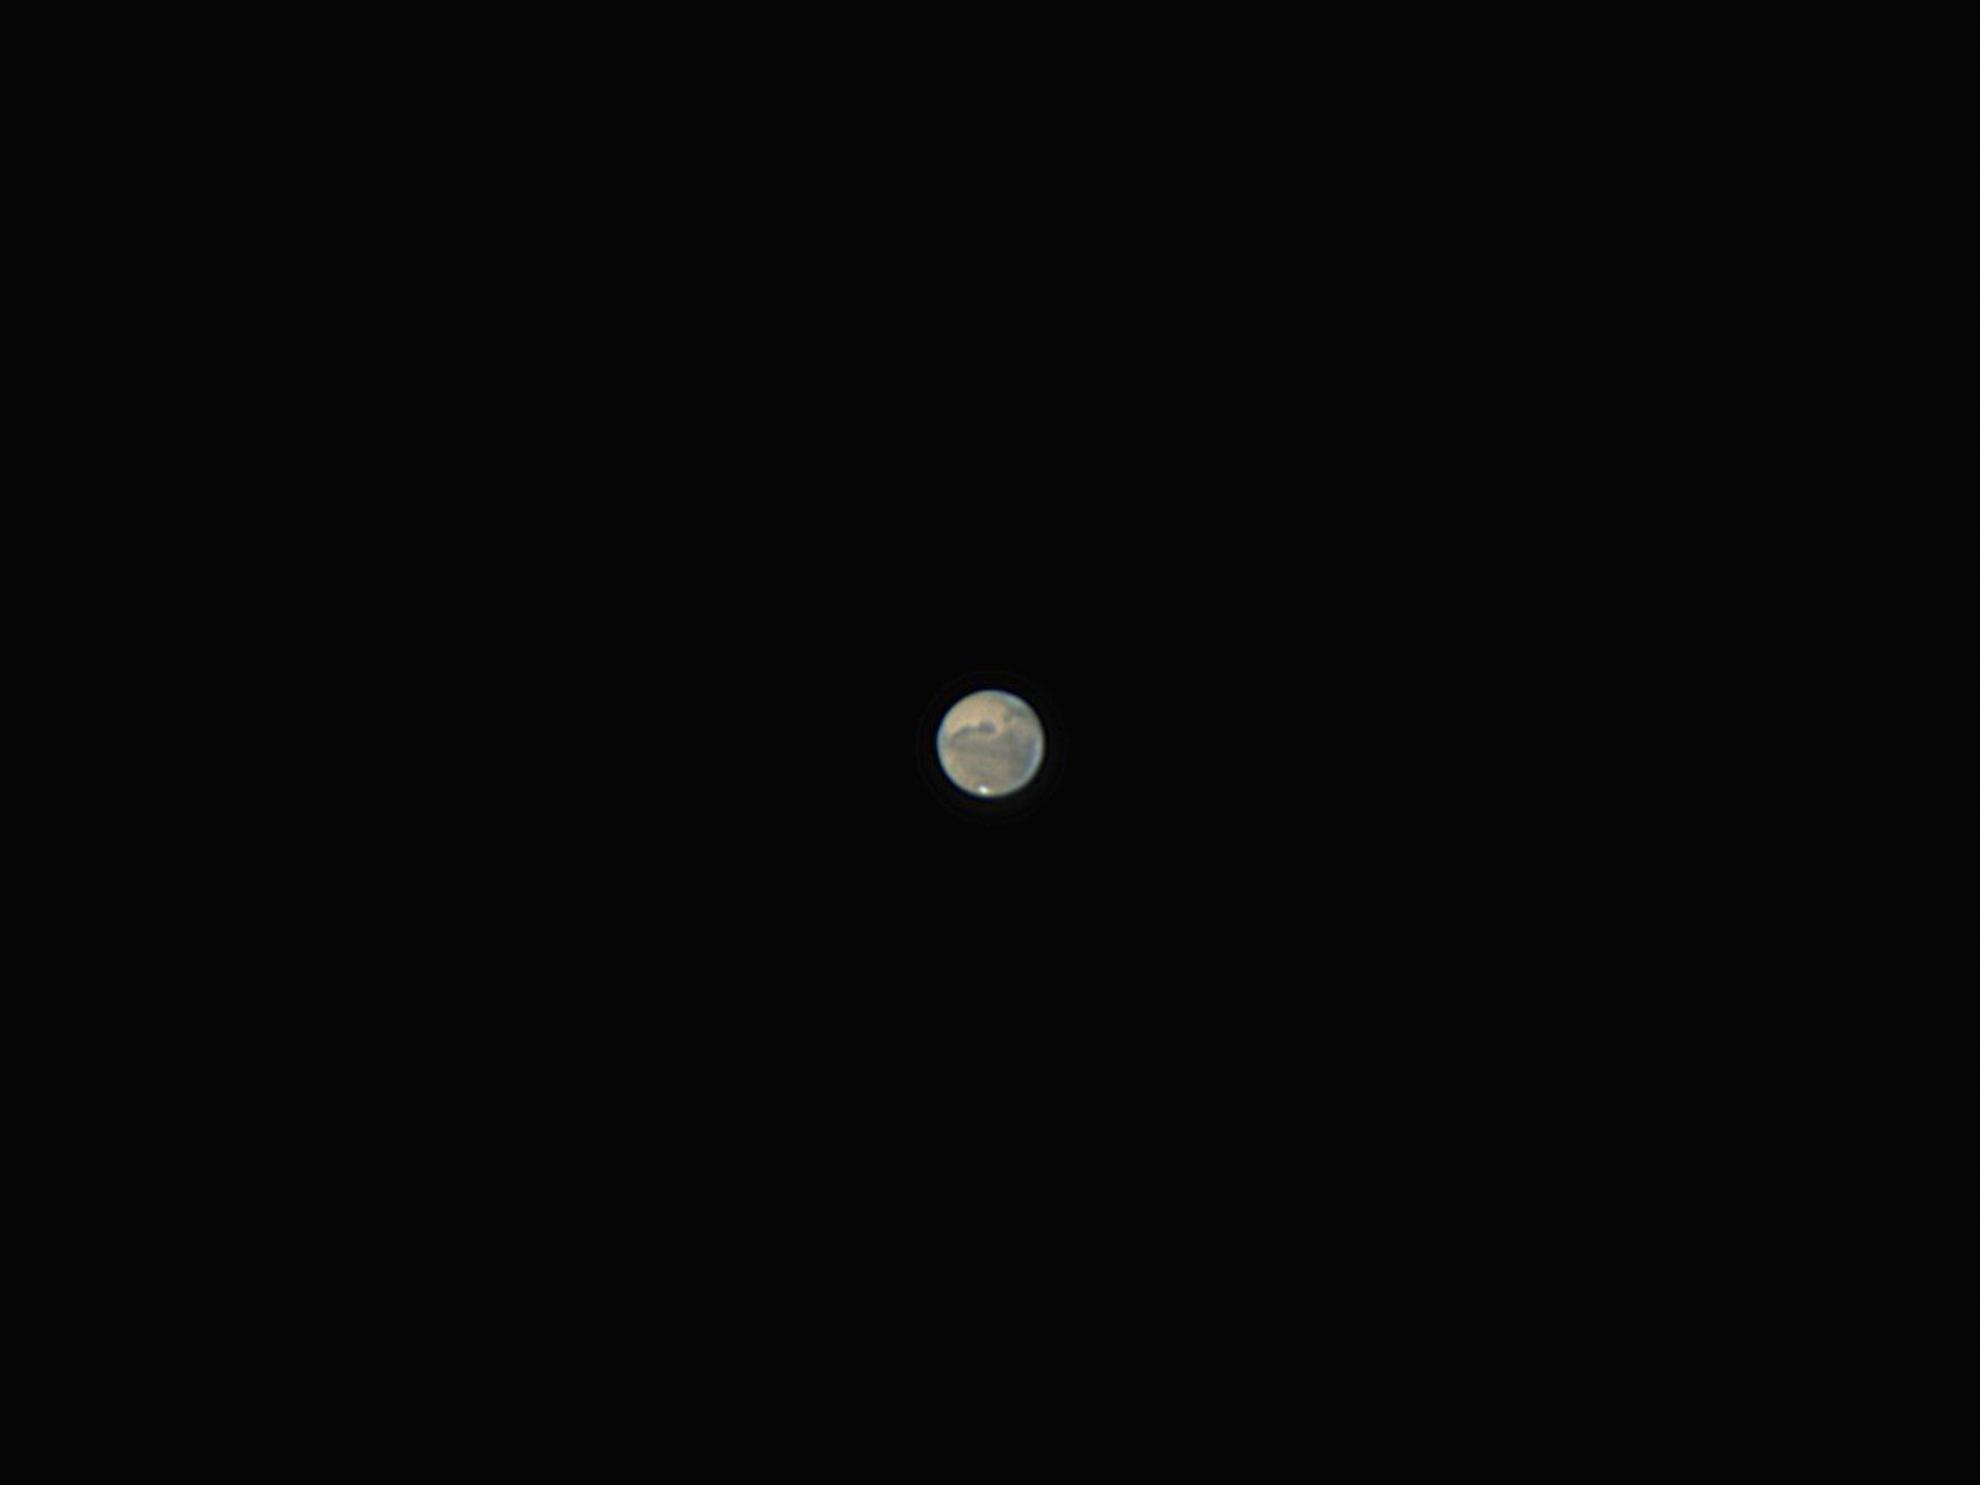 Der Mars am 24. Oktober 2020